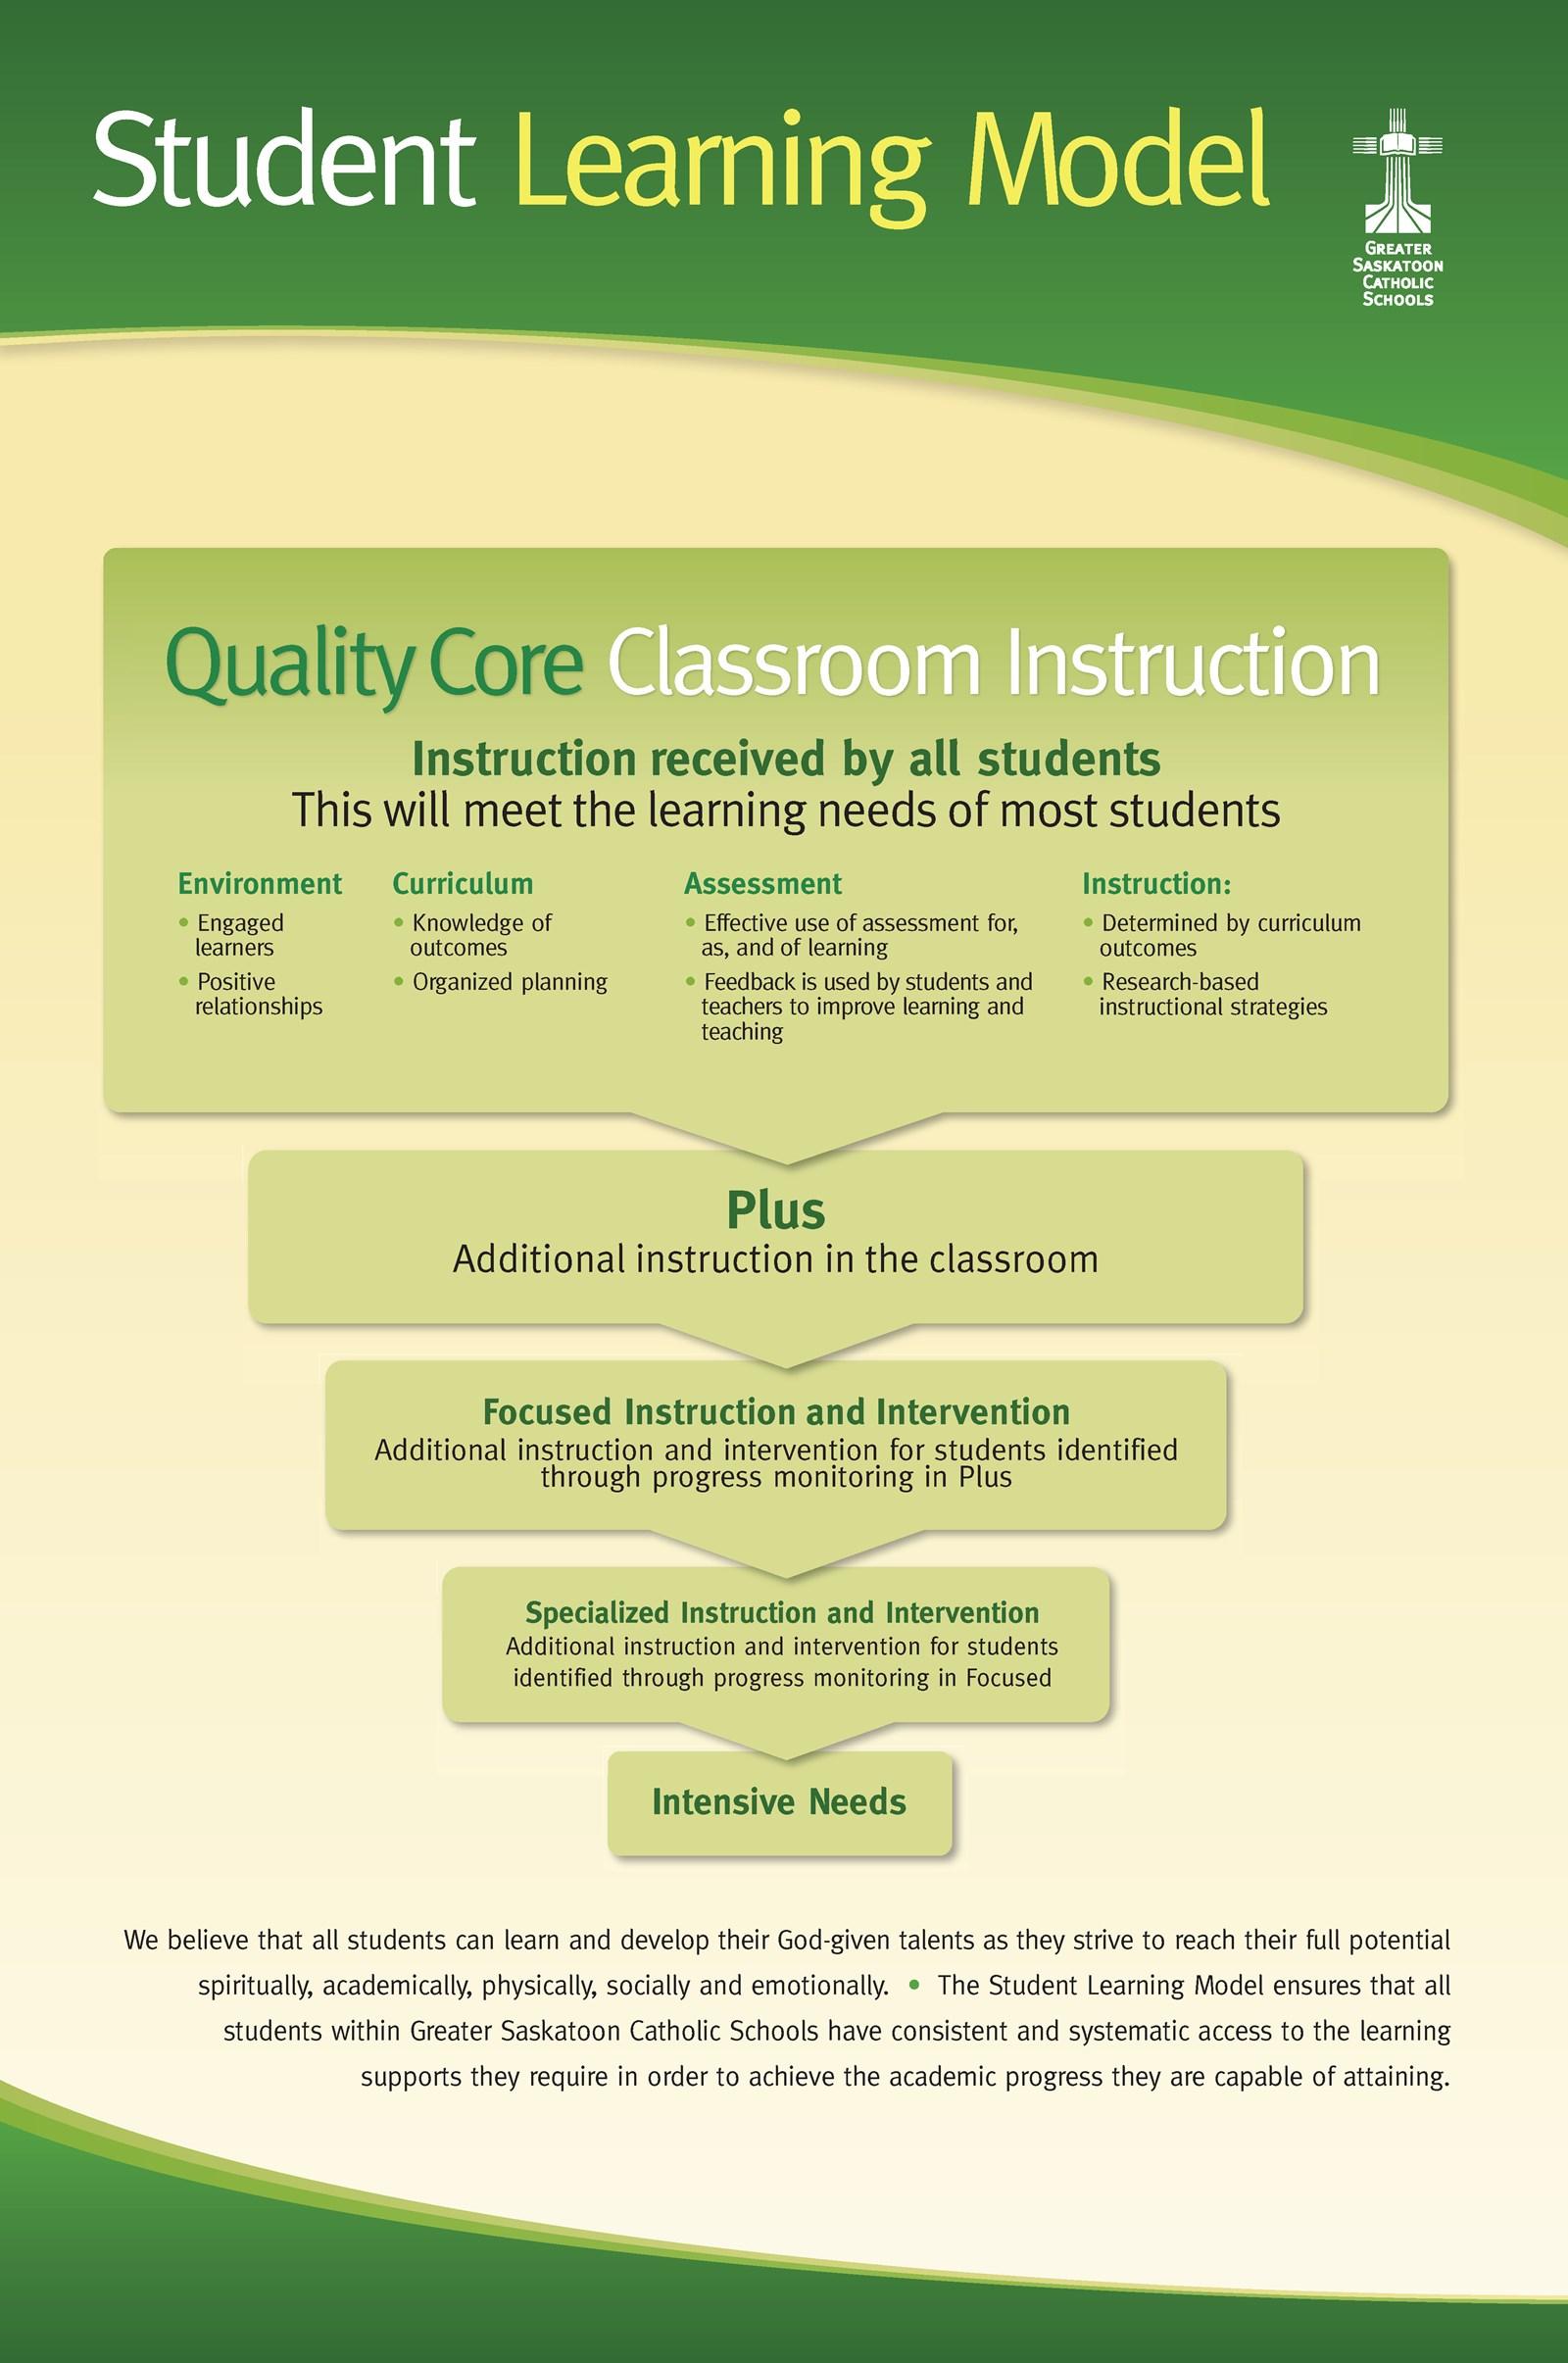 poster of Greater Saskatoon Catholic Schools' Student Learning Model